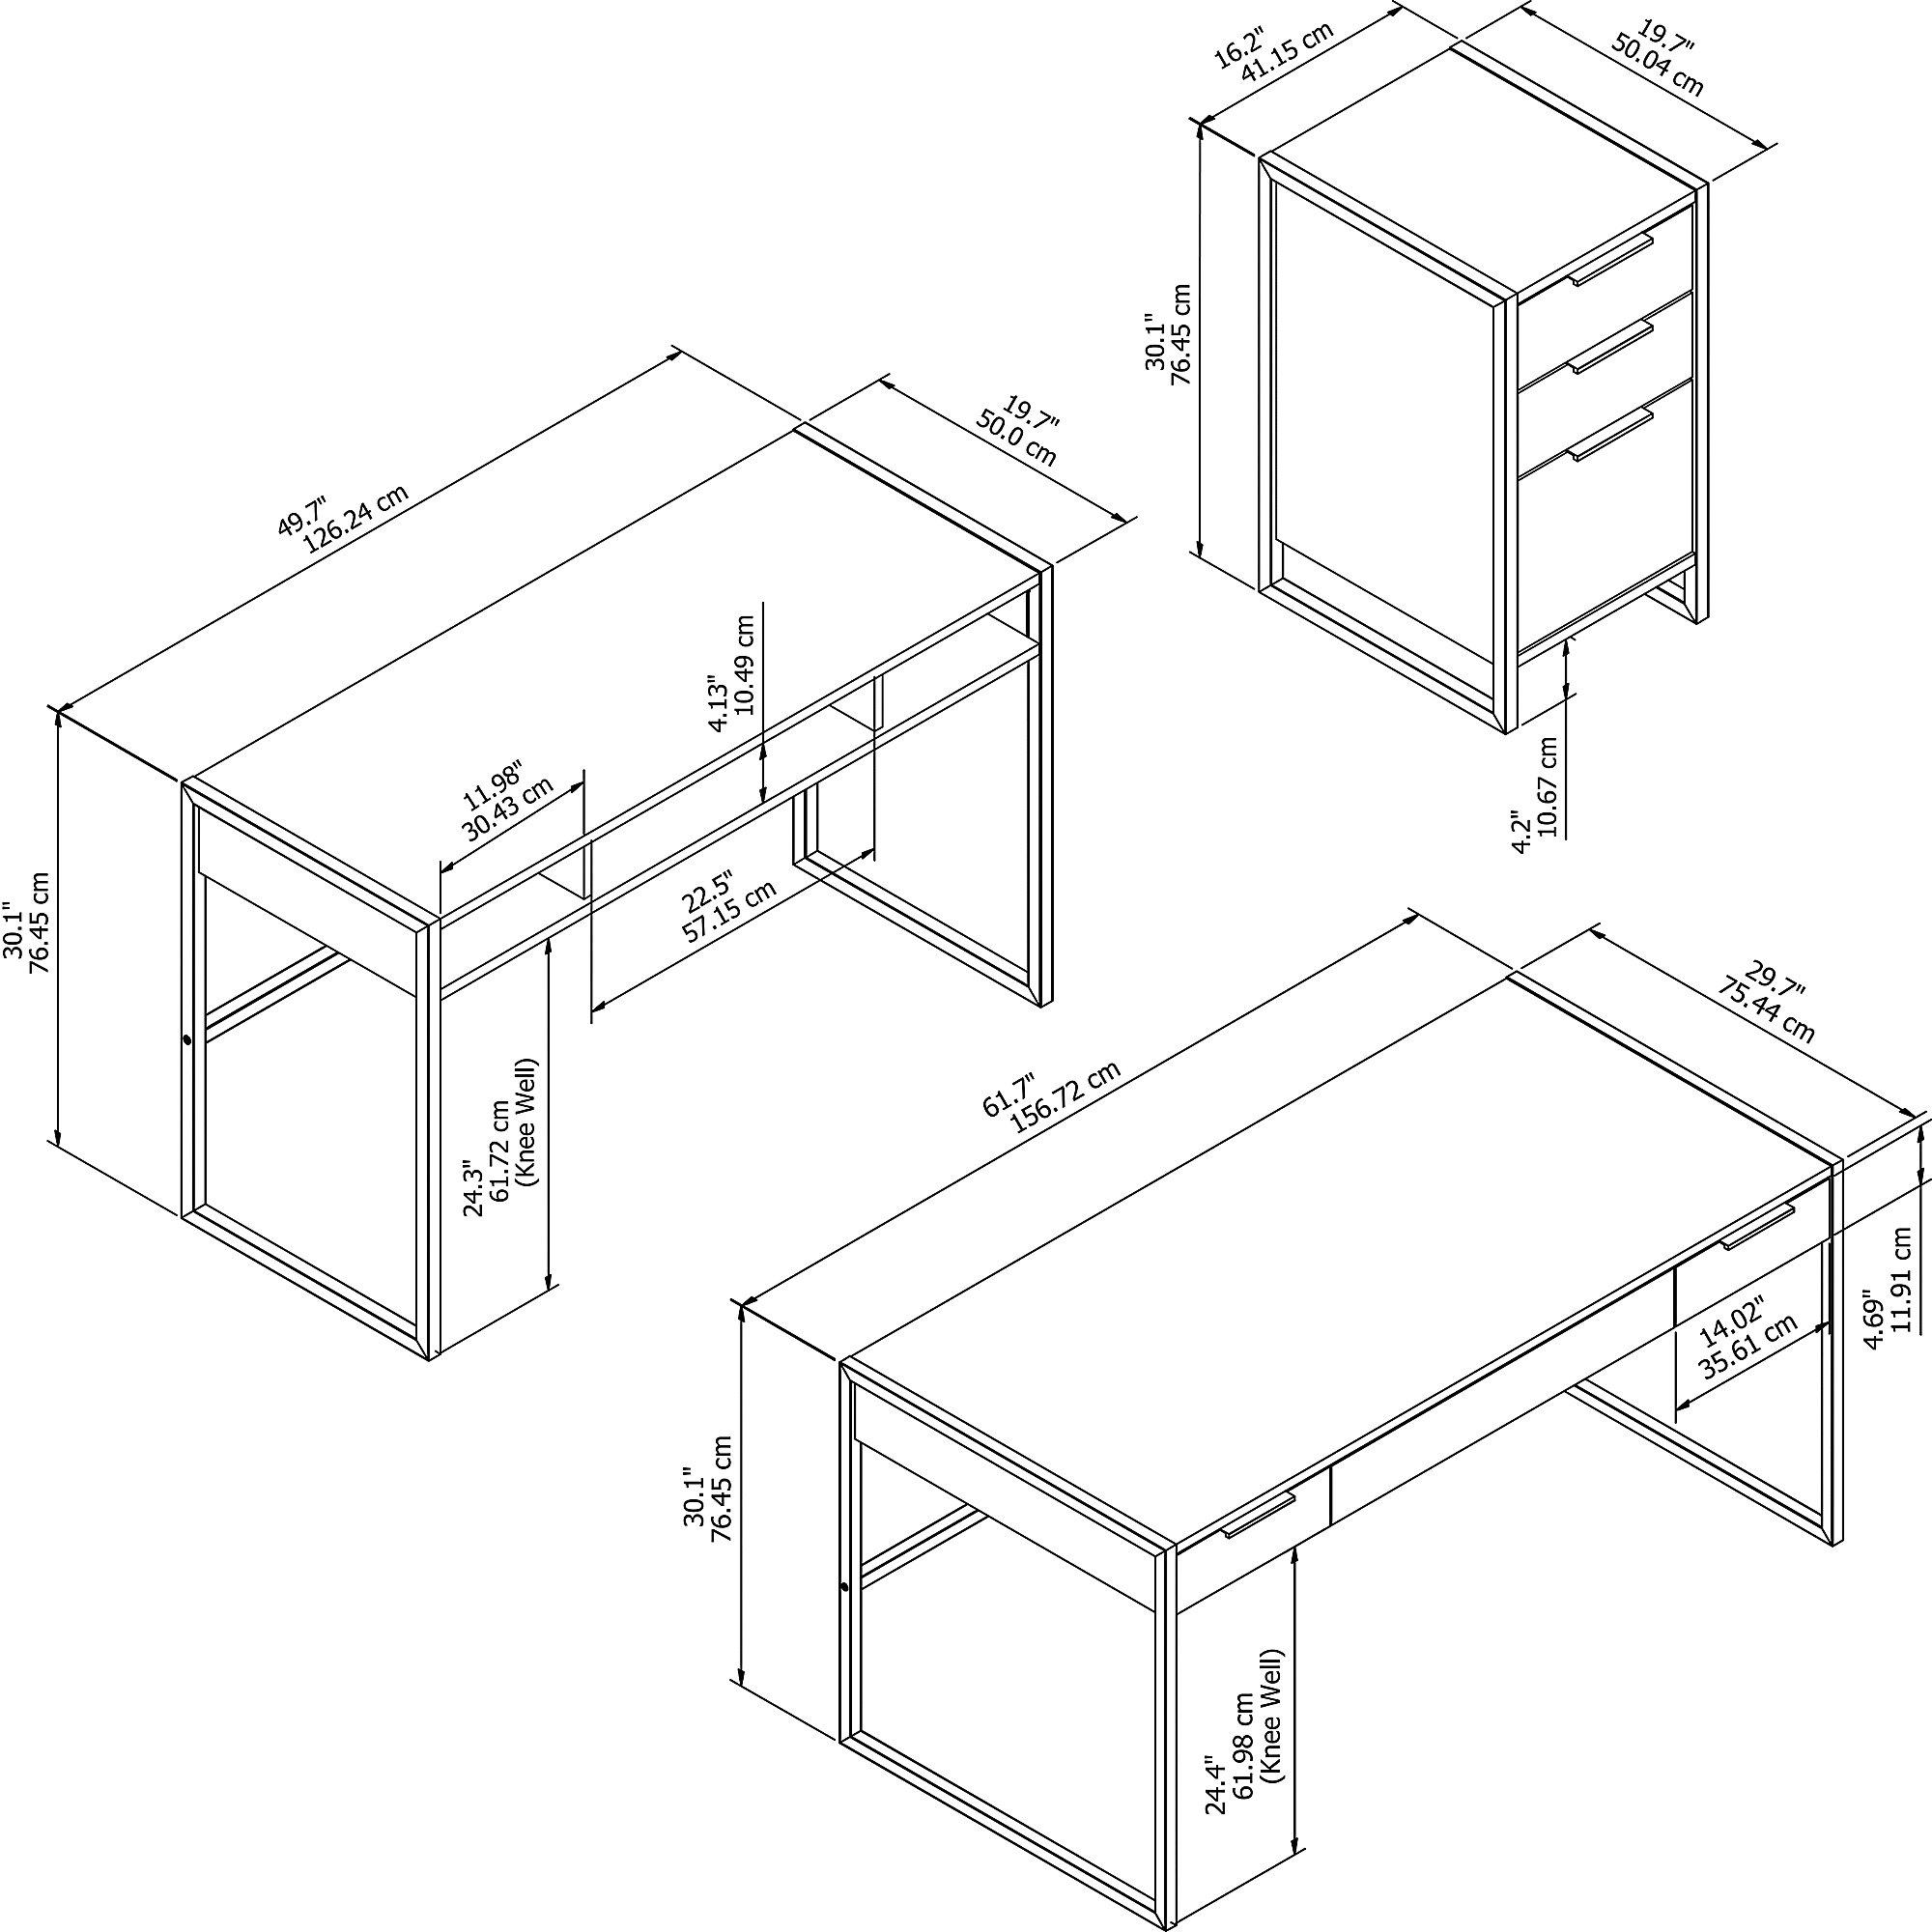 atr002 desk dimensions